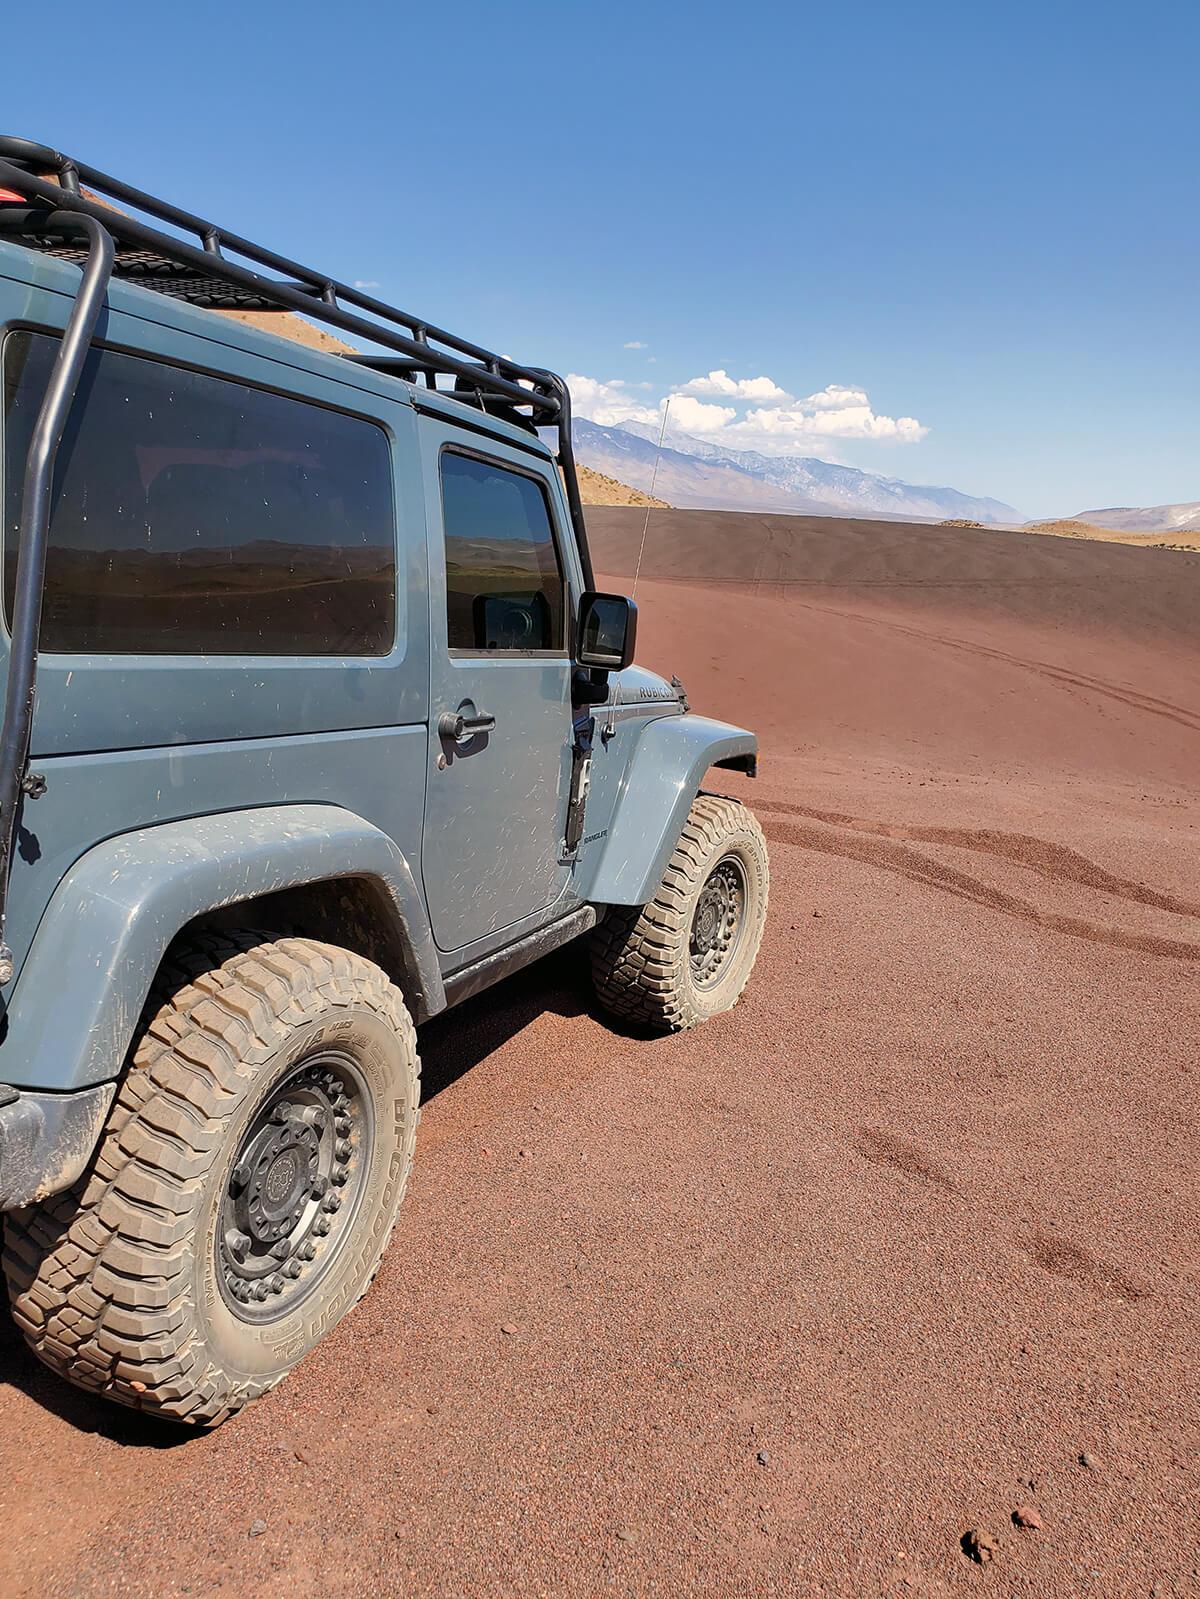 R17 33's BFGoodrich km3 mud terrains tires with black rhino Armory rims on gunblack color